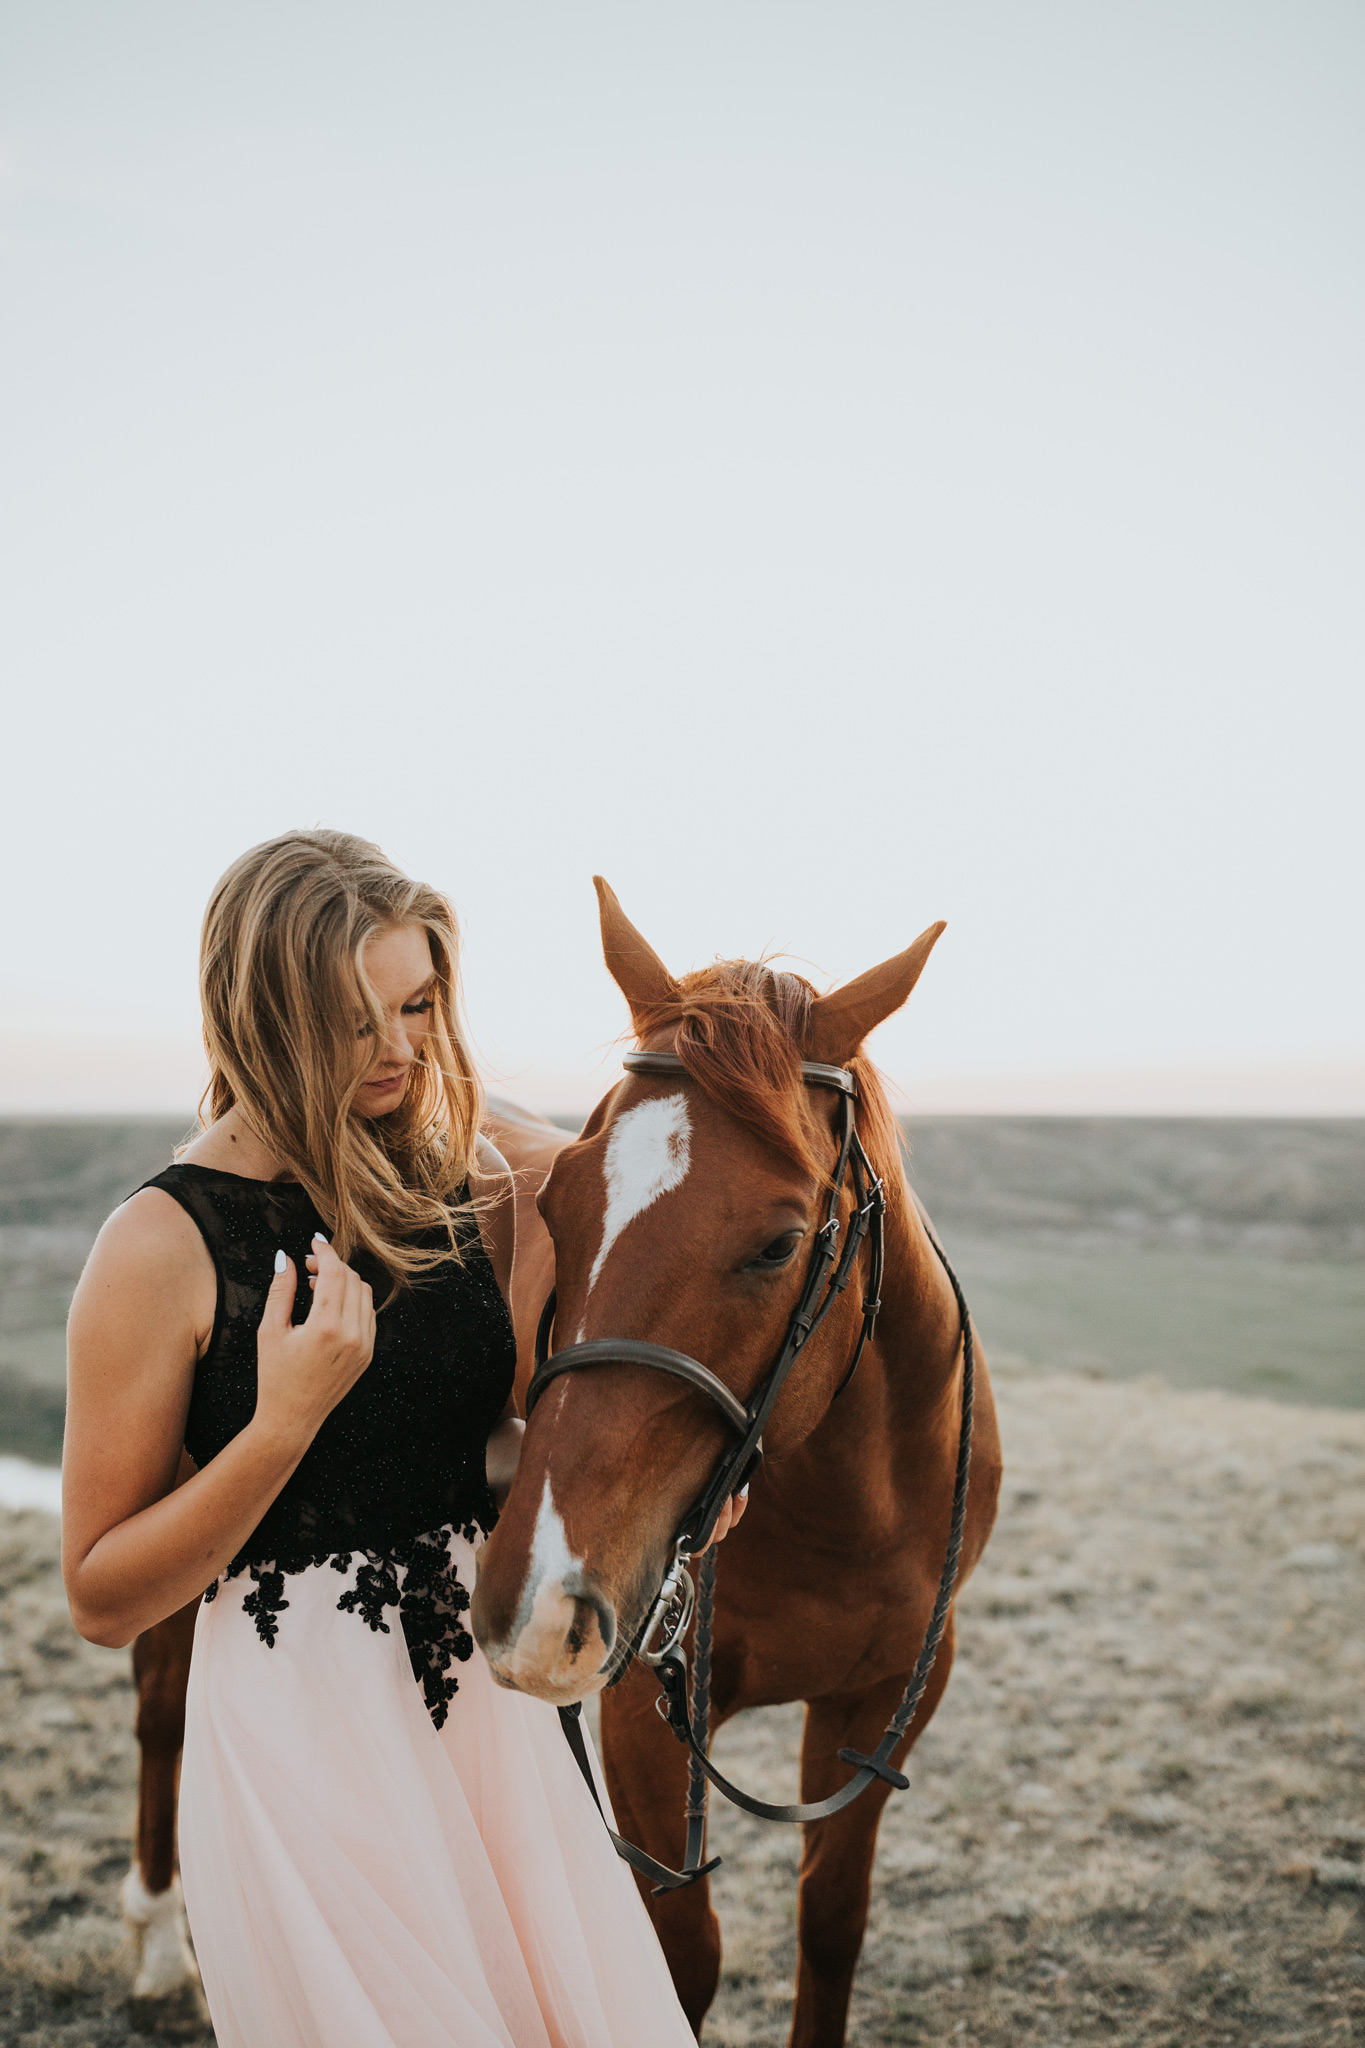 grad girl standing beside horse hair blowing in wind